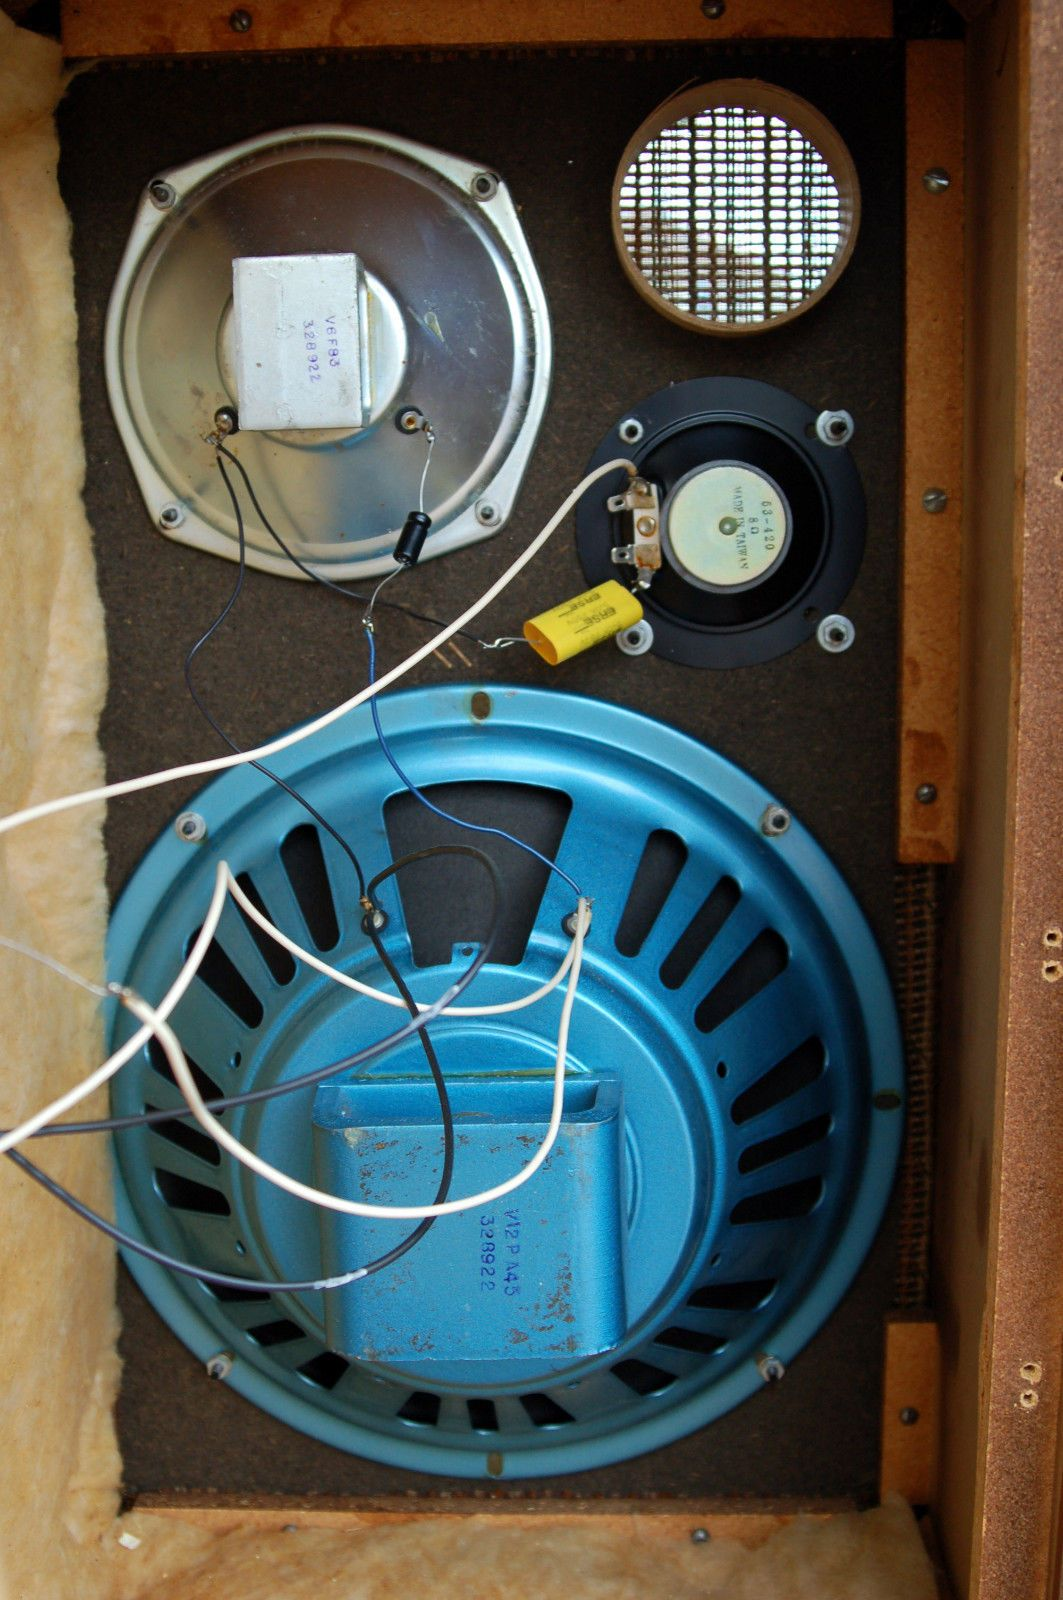 medium resolution of vintage utah wd 66 12 3 way speaker system 8 ohms 30 watts made in usa ebay